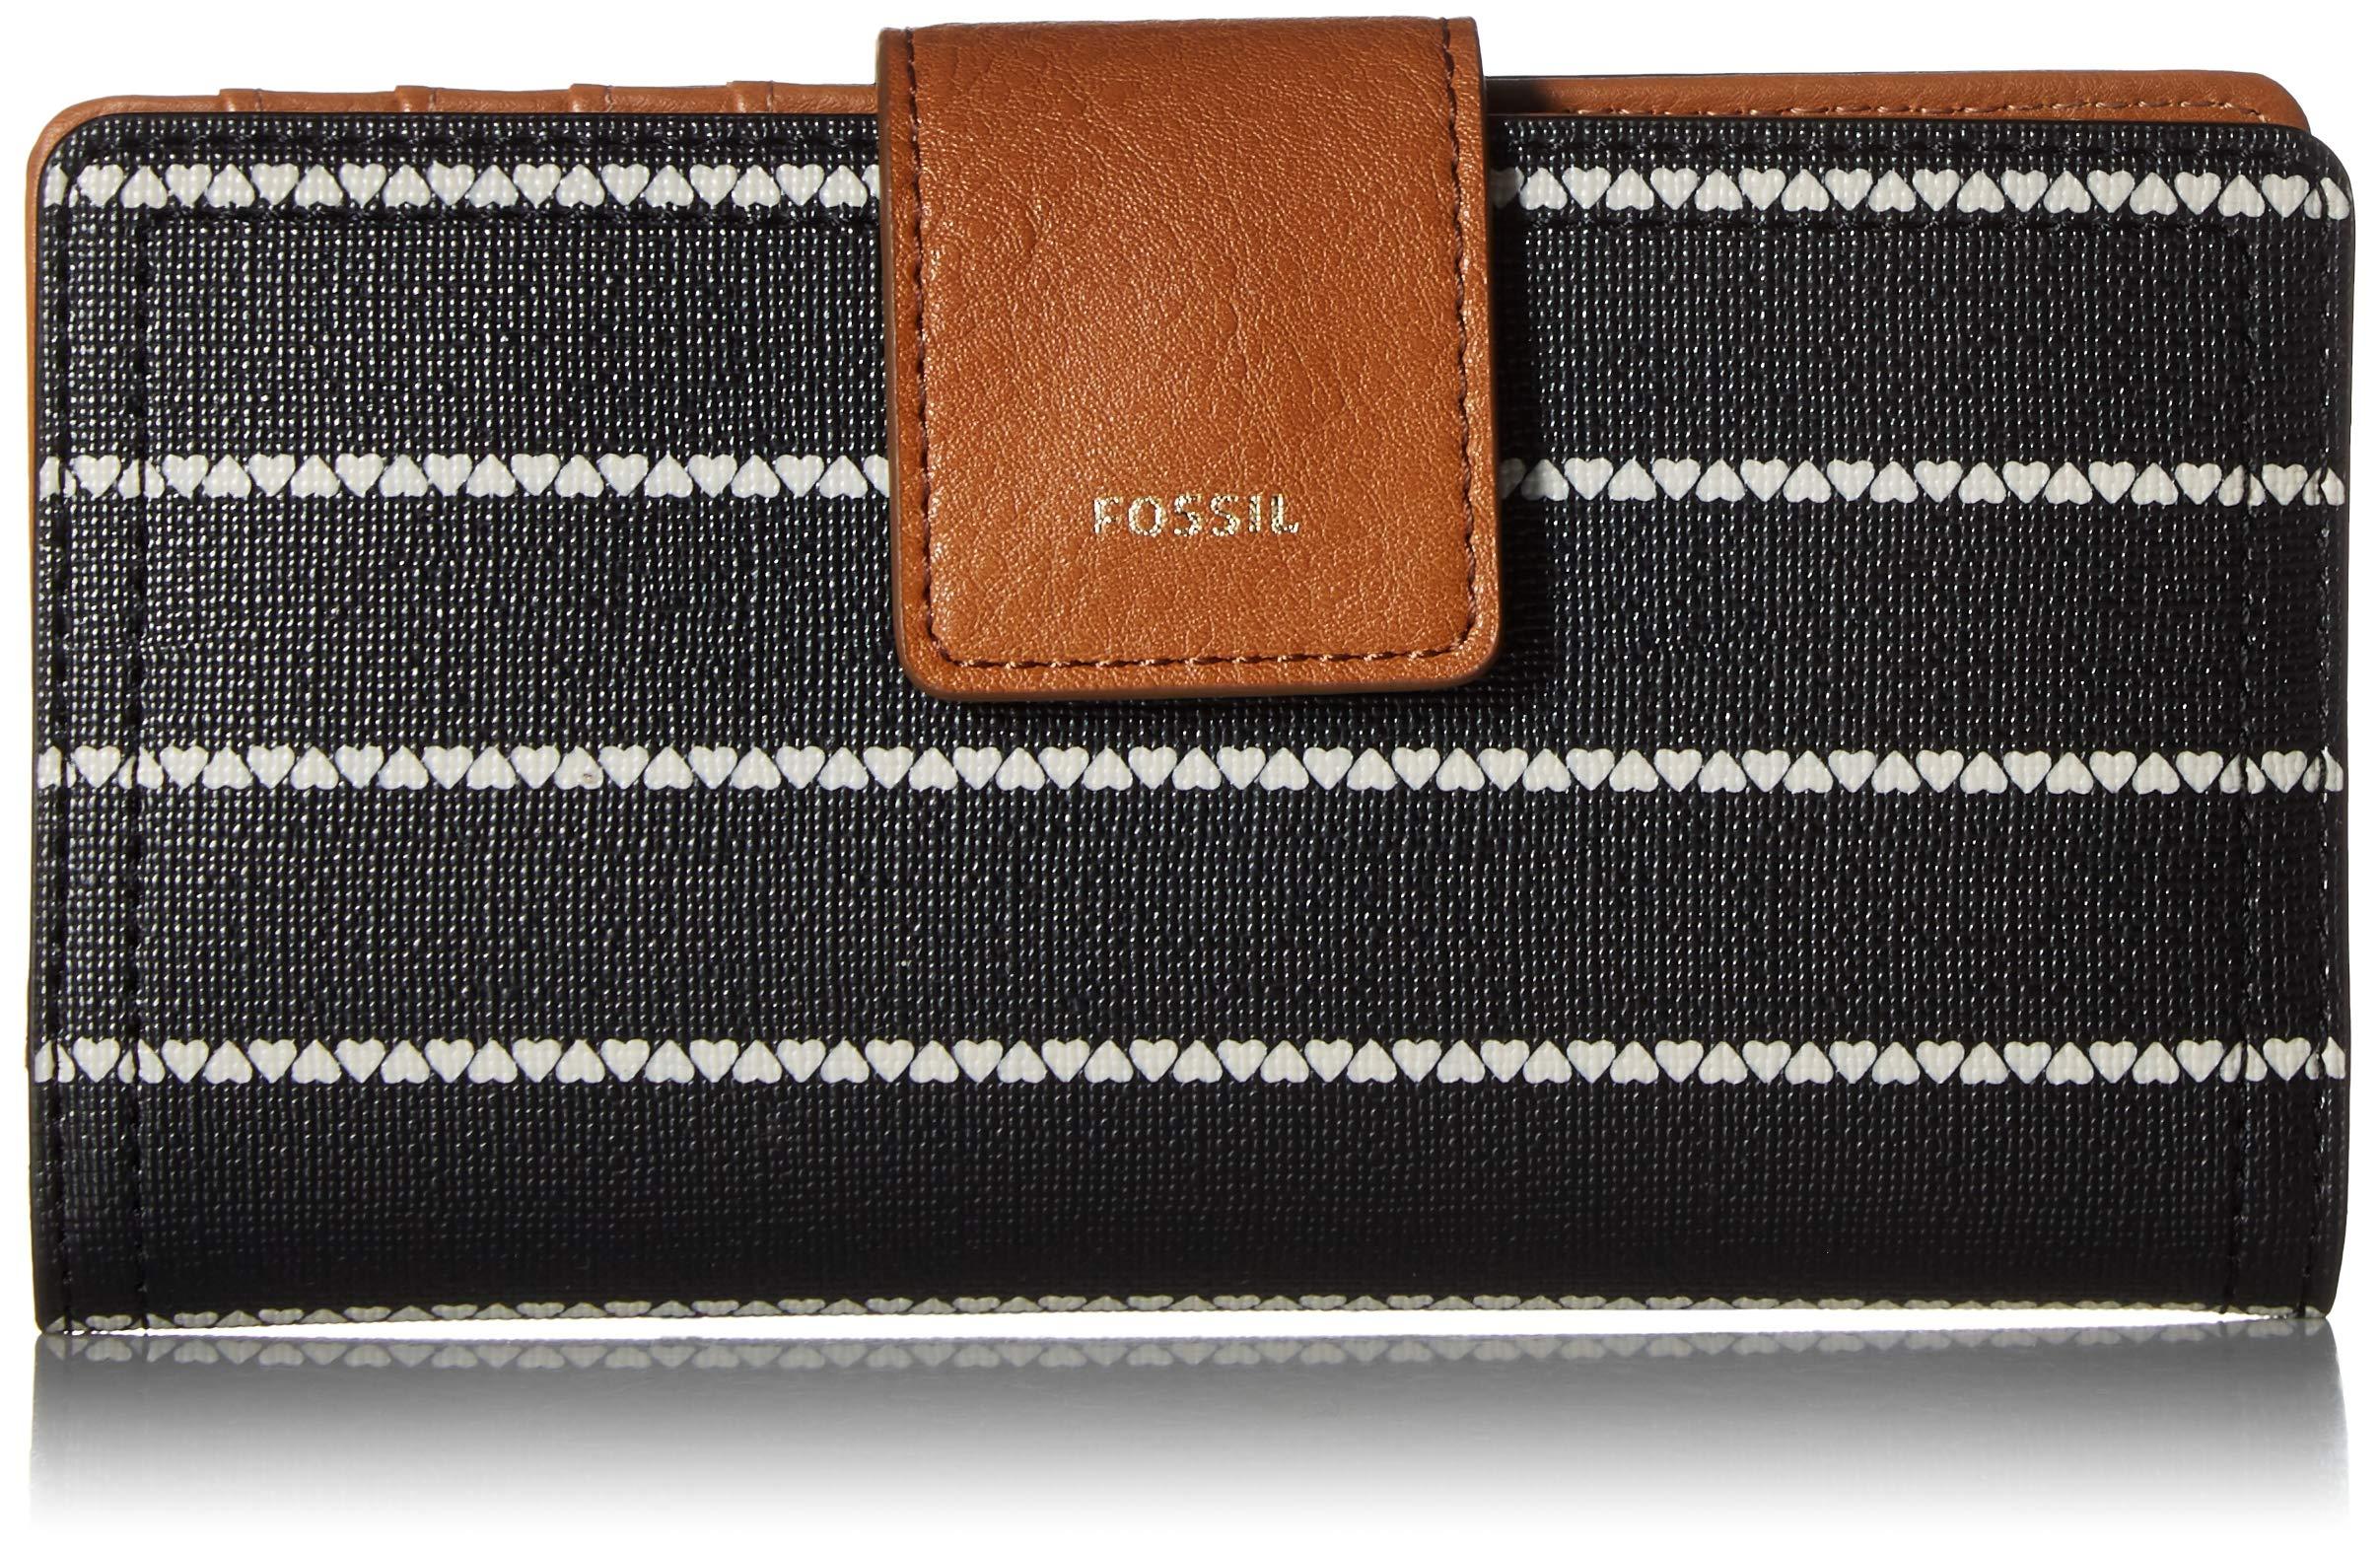 Fossil Logan RFID Tab Wallet, Black/White